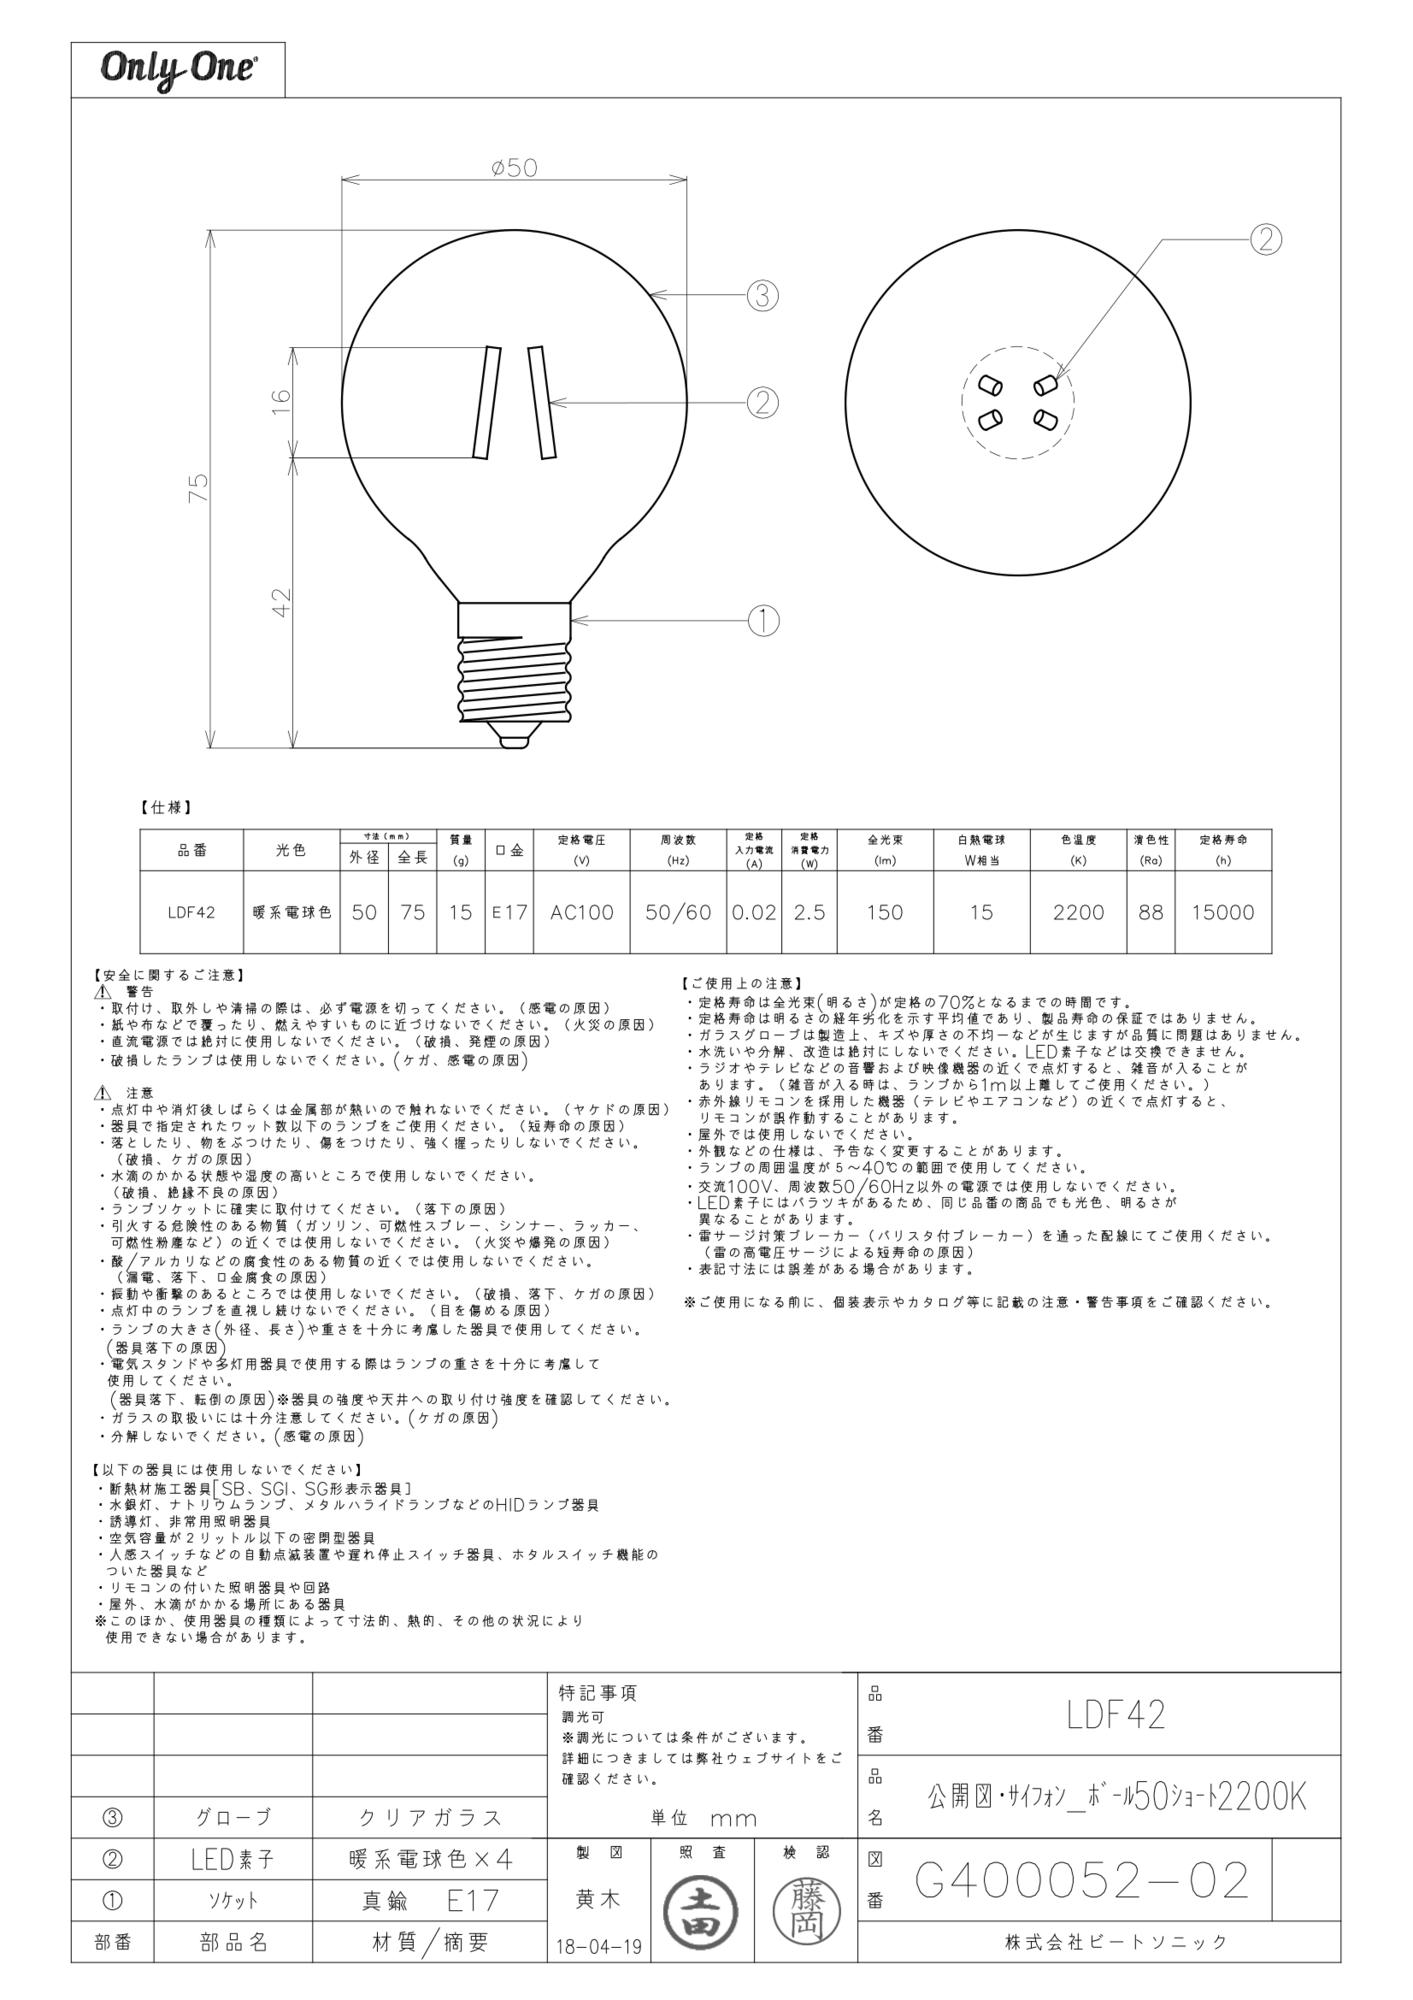 Middle 3ab2c8e1680784b9ef55